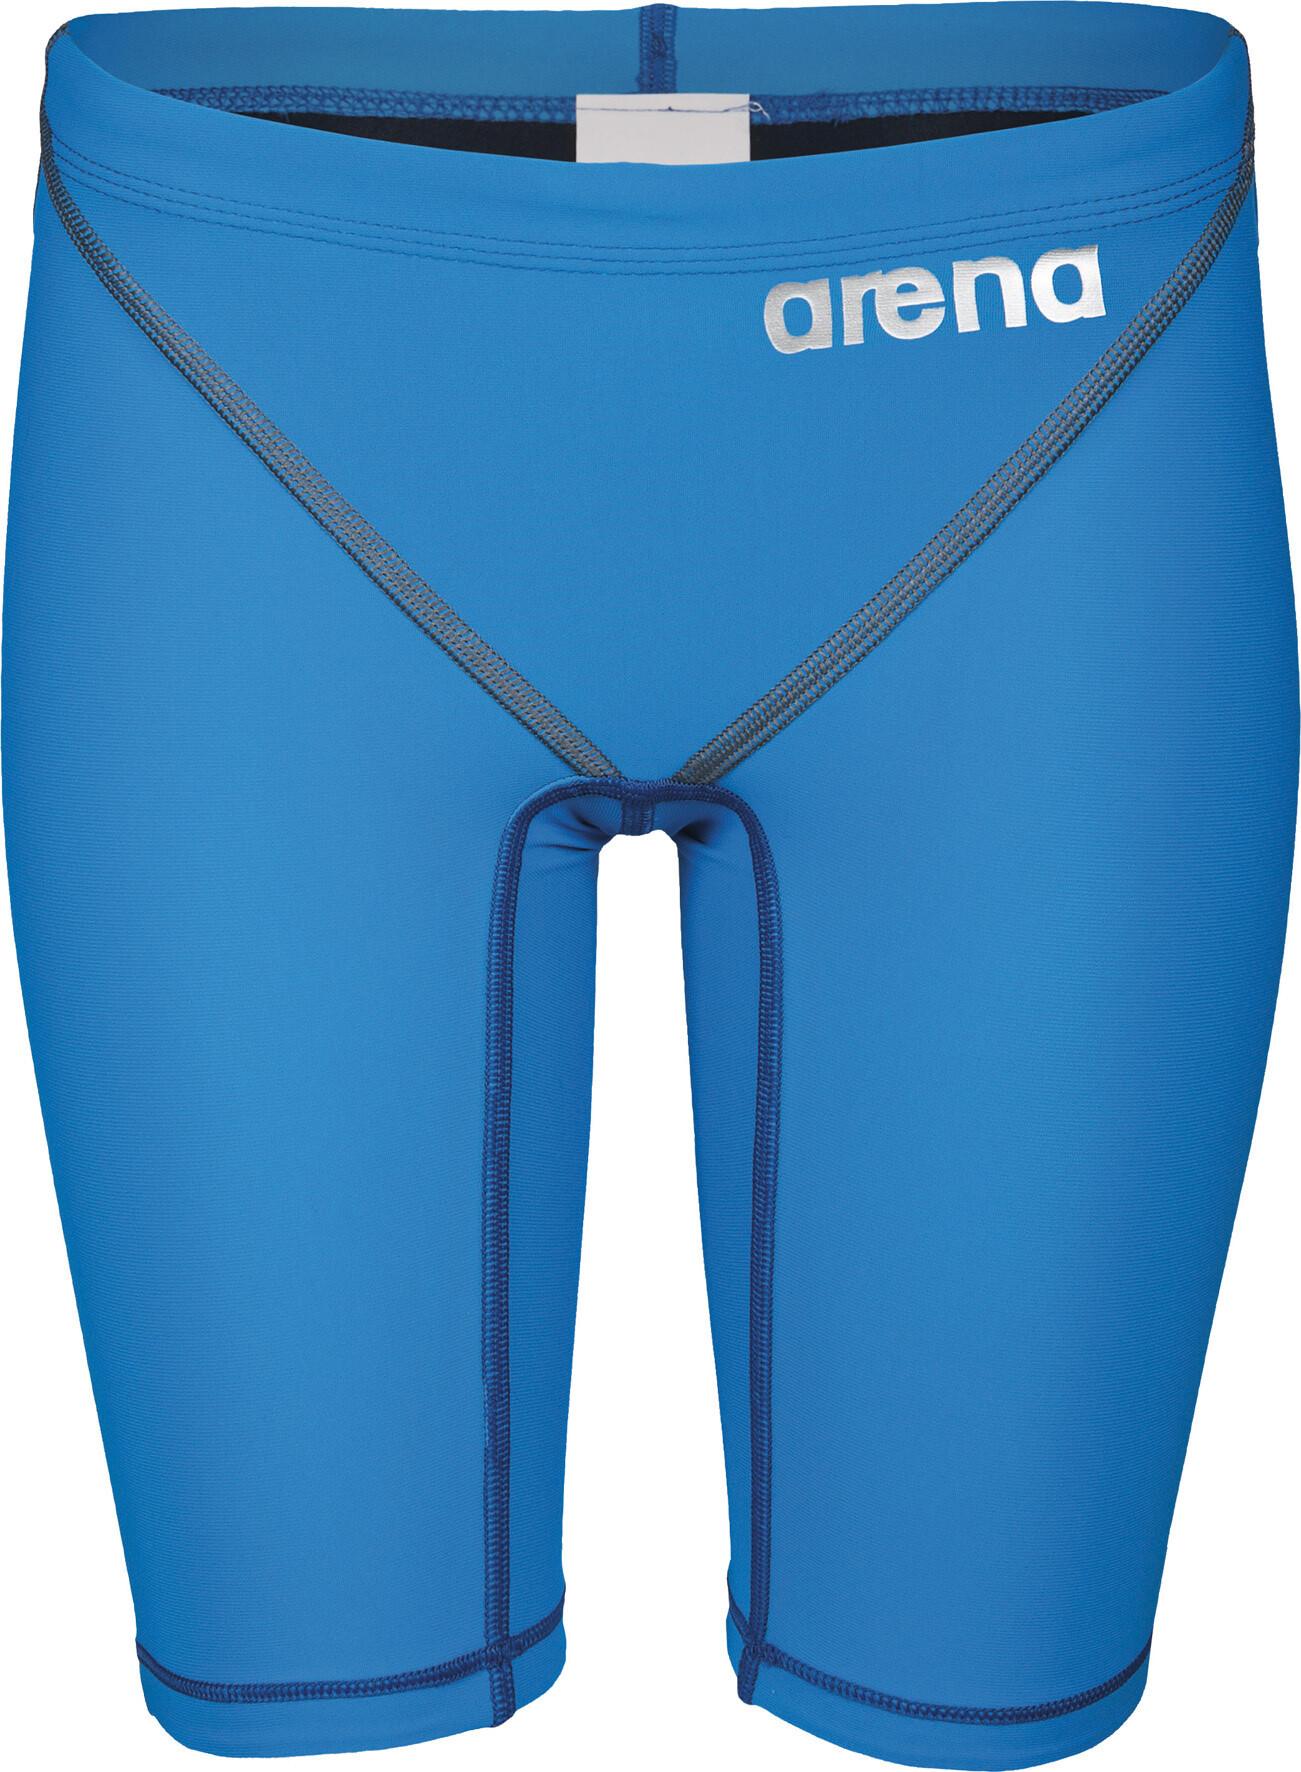 arena Powerskin ST 2.0 Badebukser Drenge, royal (2019) | swim_clothes